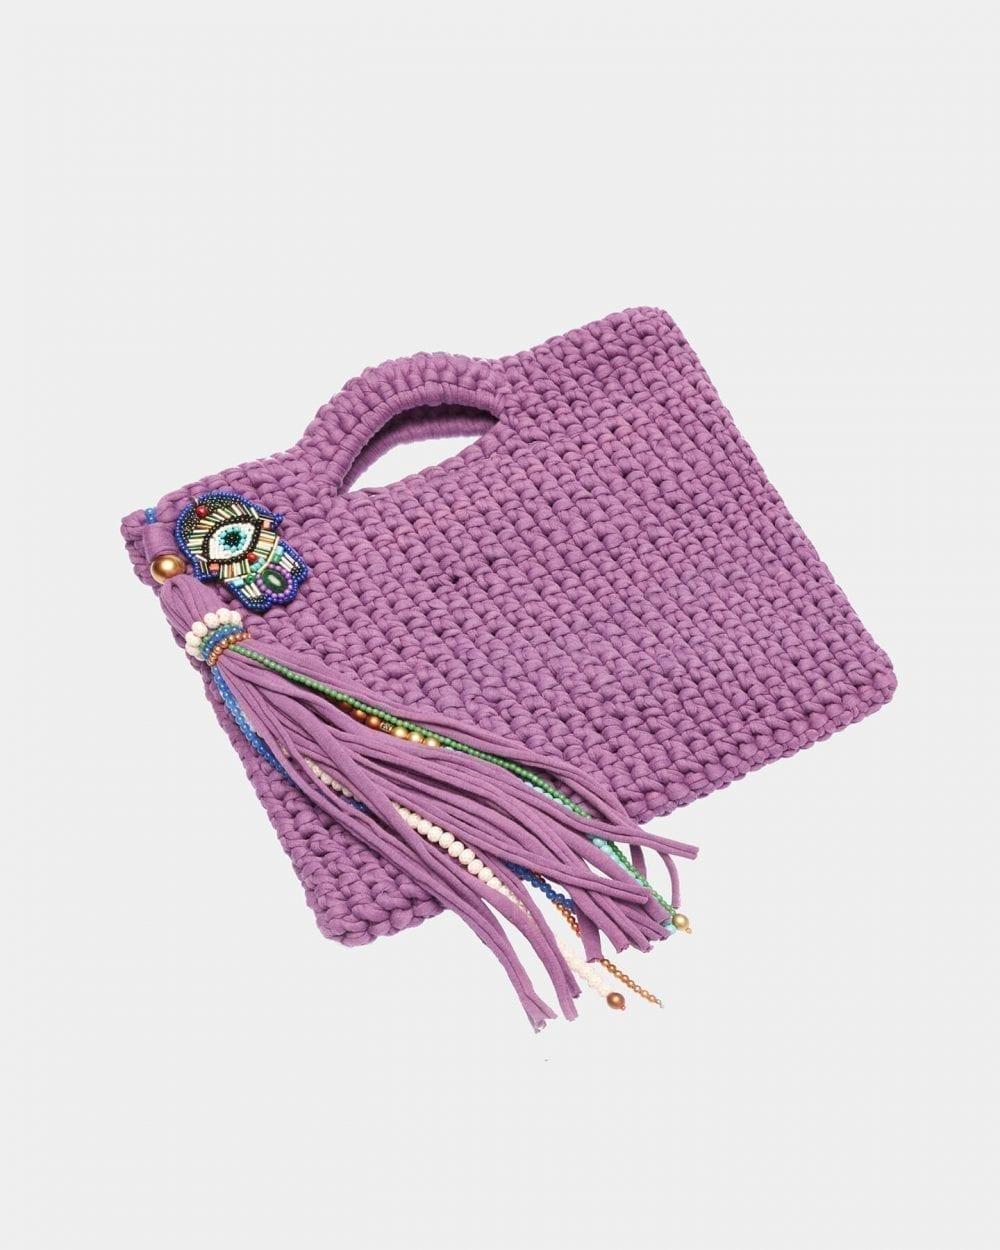 Collette Purple handbag by ALLBYB Design, Philadelphia